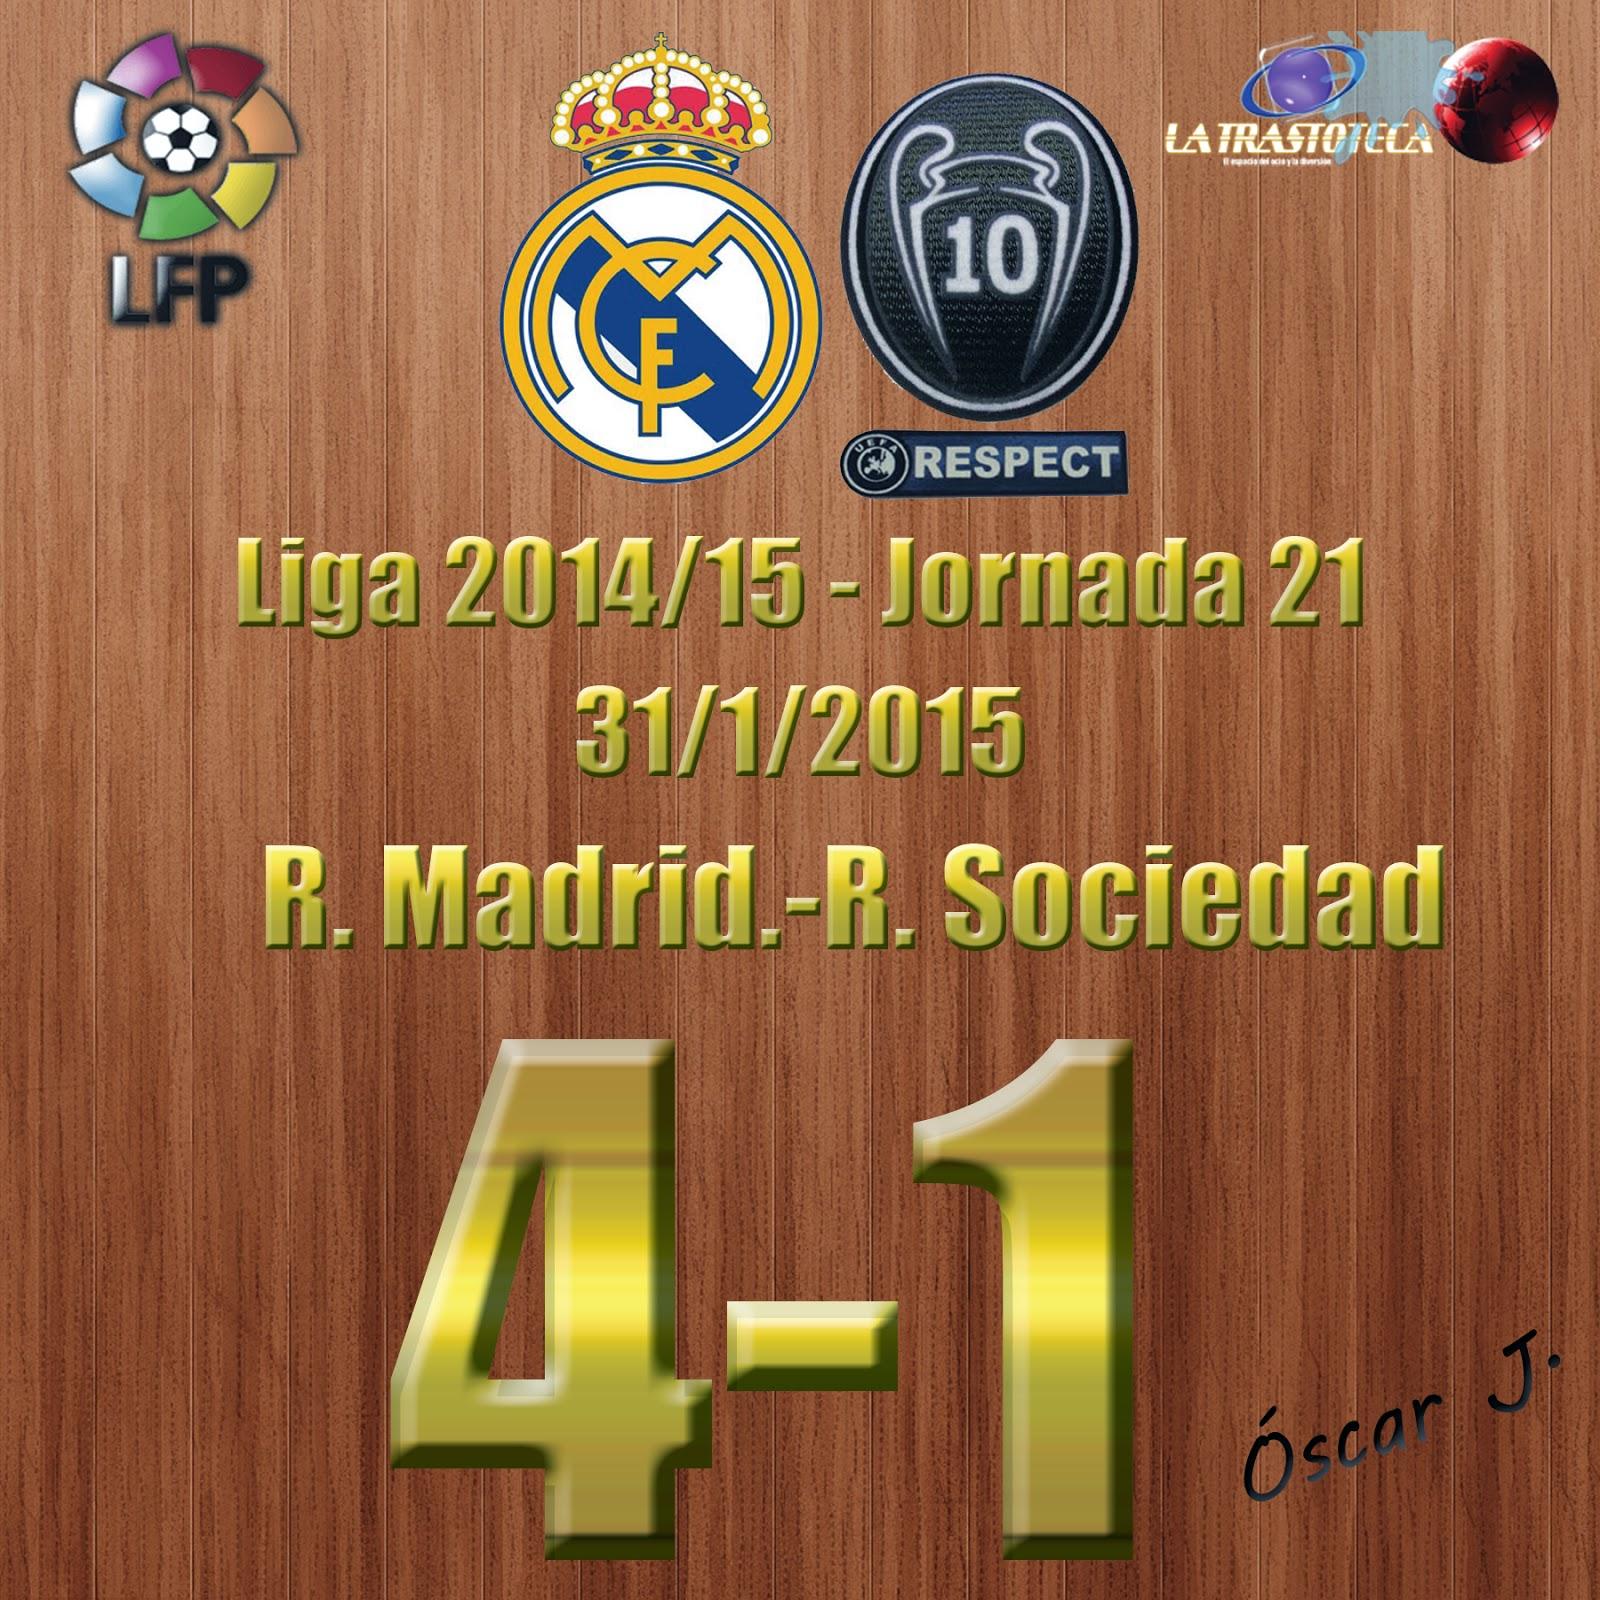 Sergio Ramos (2-1) - Real Madrid 4-1 Real Sociedad - Liga 2014/15 - Jornada 21 - (31/1/2015)